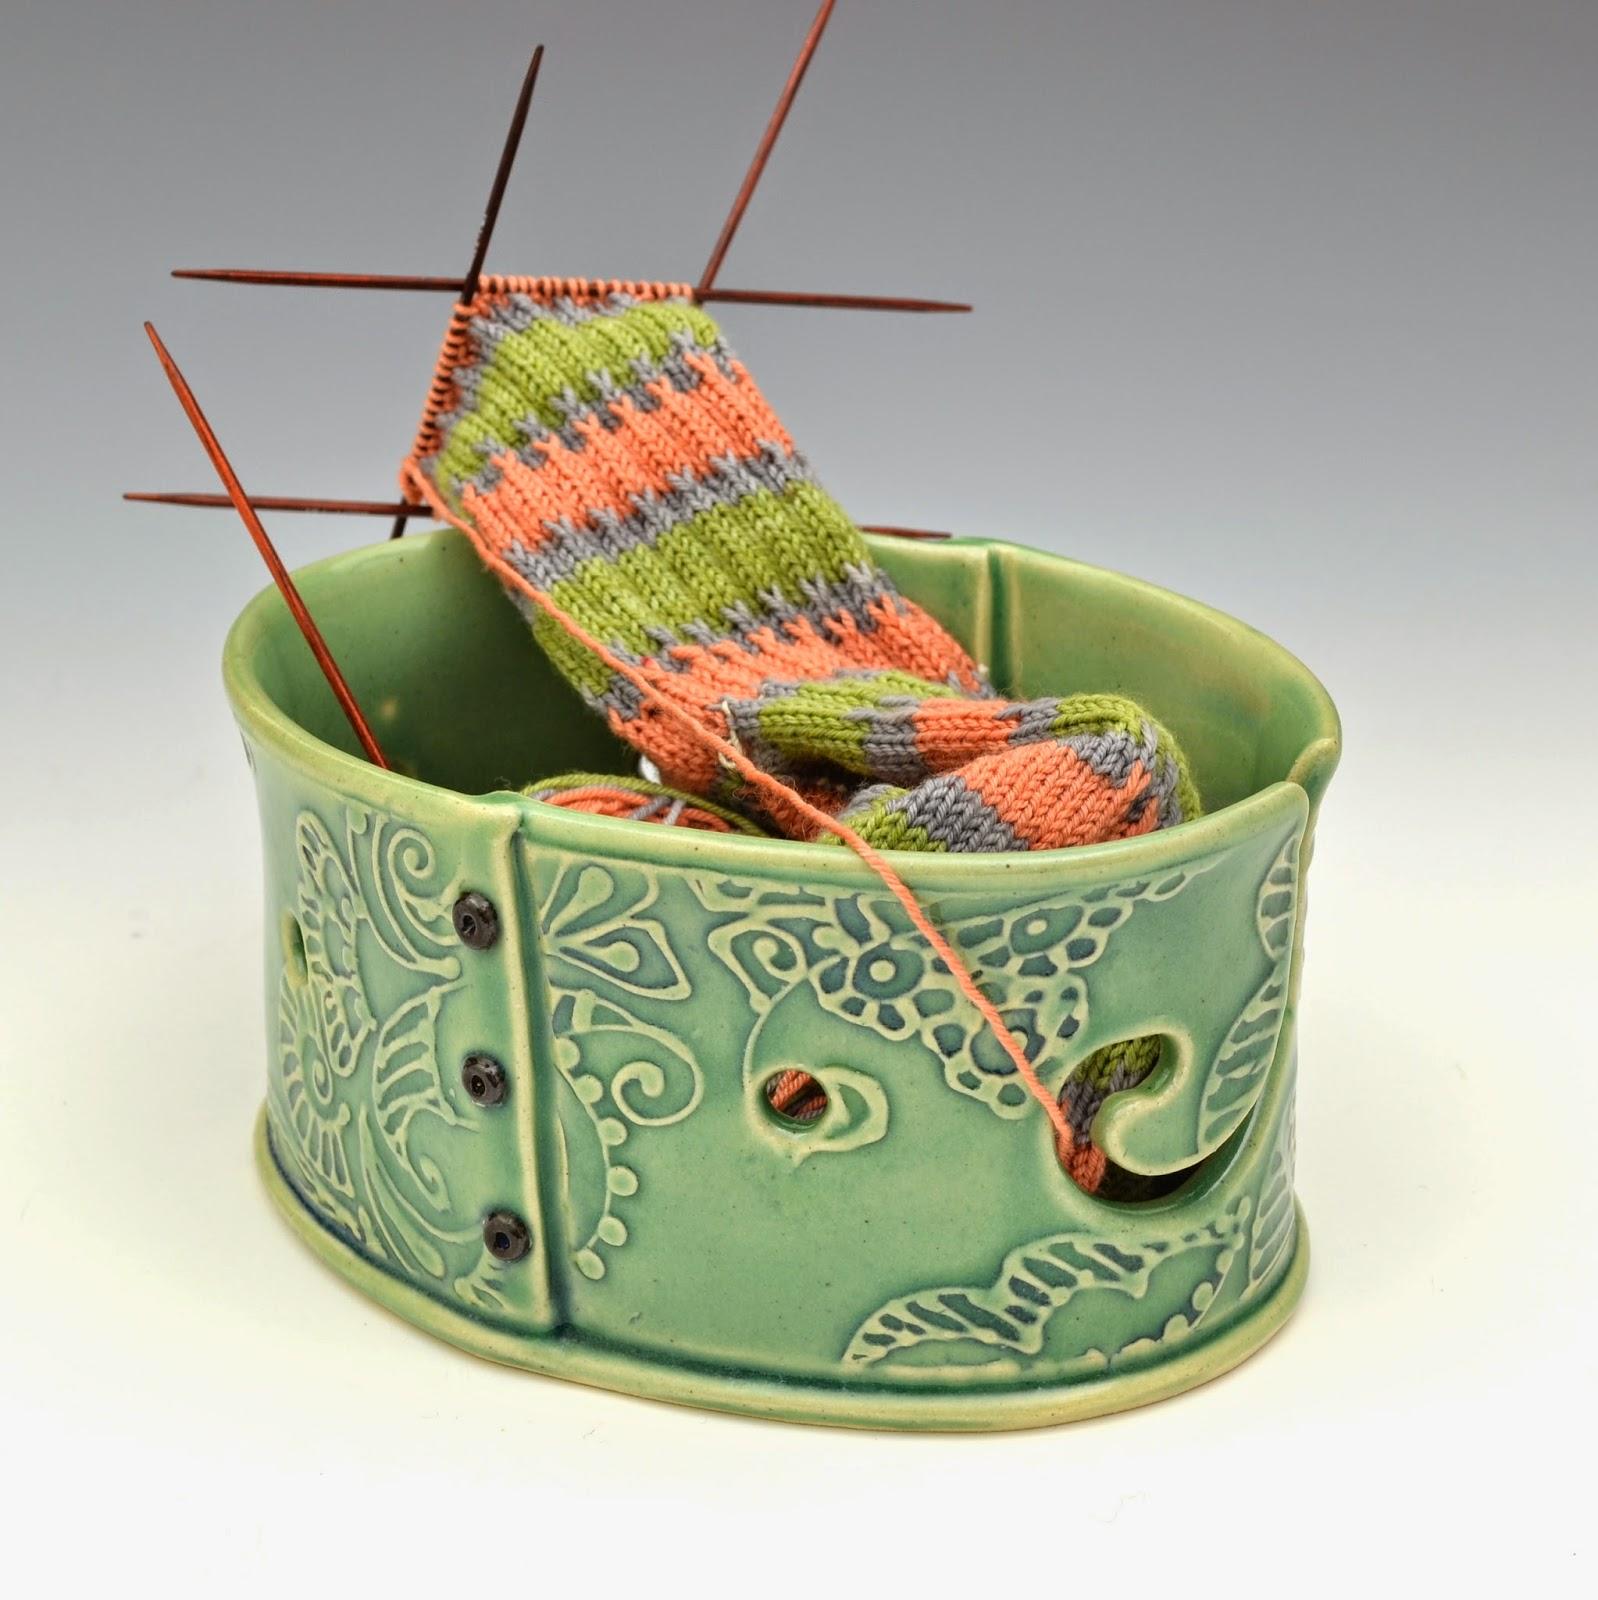 Knitting Yarn Bowl : Creative with clay pottery by charan sachar yarn bowls